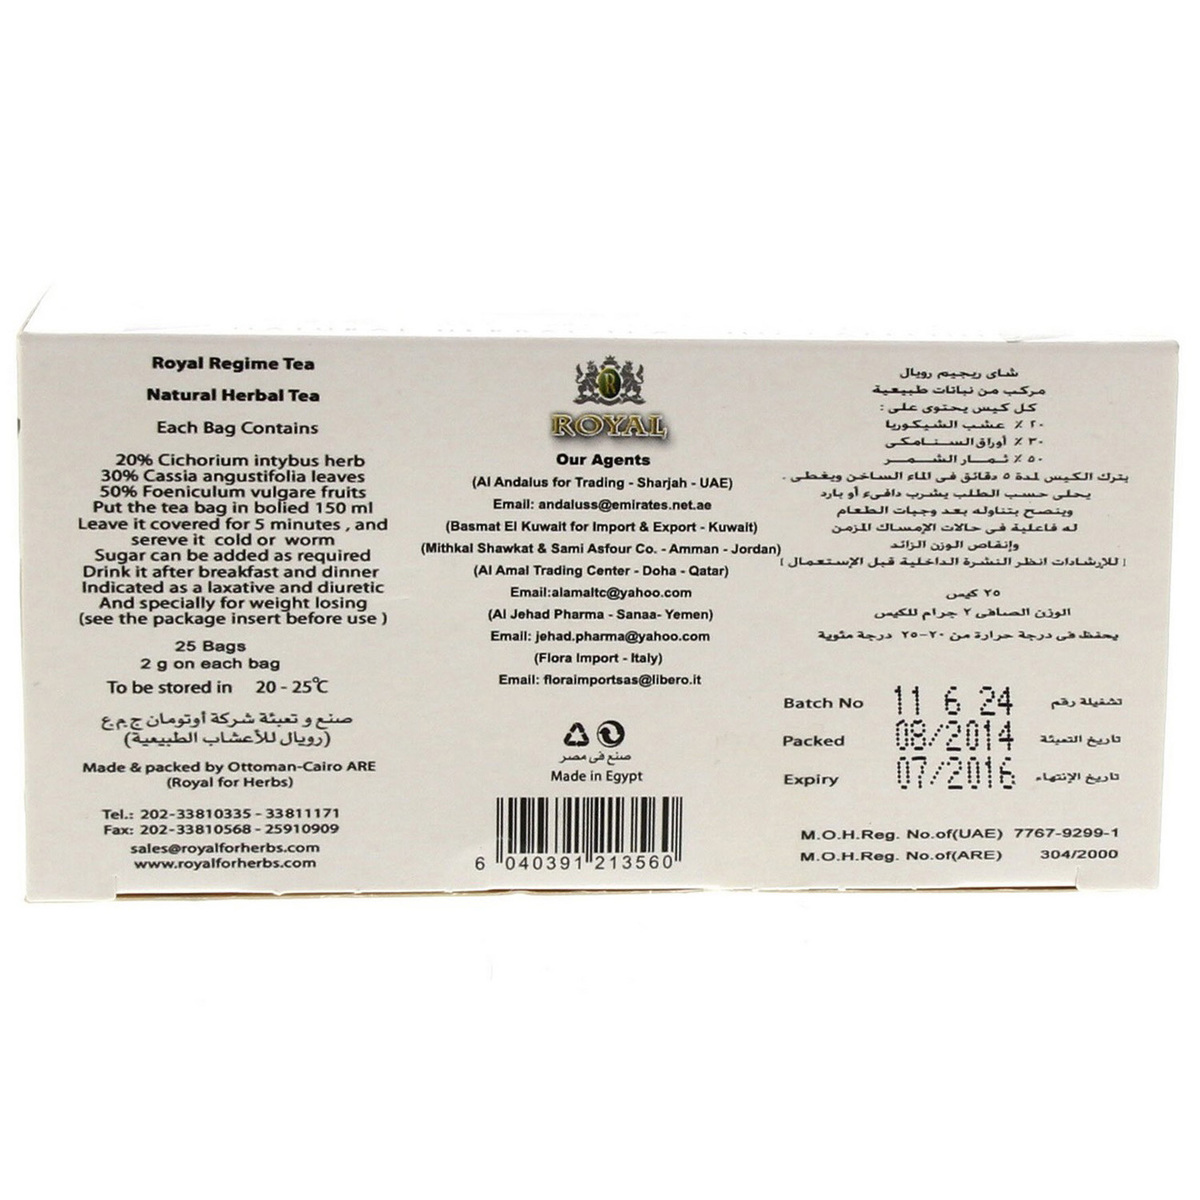 Buy Royal Regime Natural Herbal Tea 25pcs - Speciality Tea